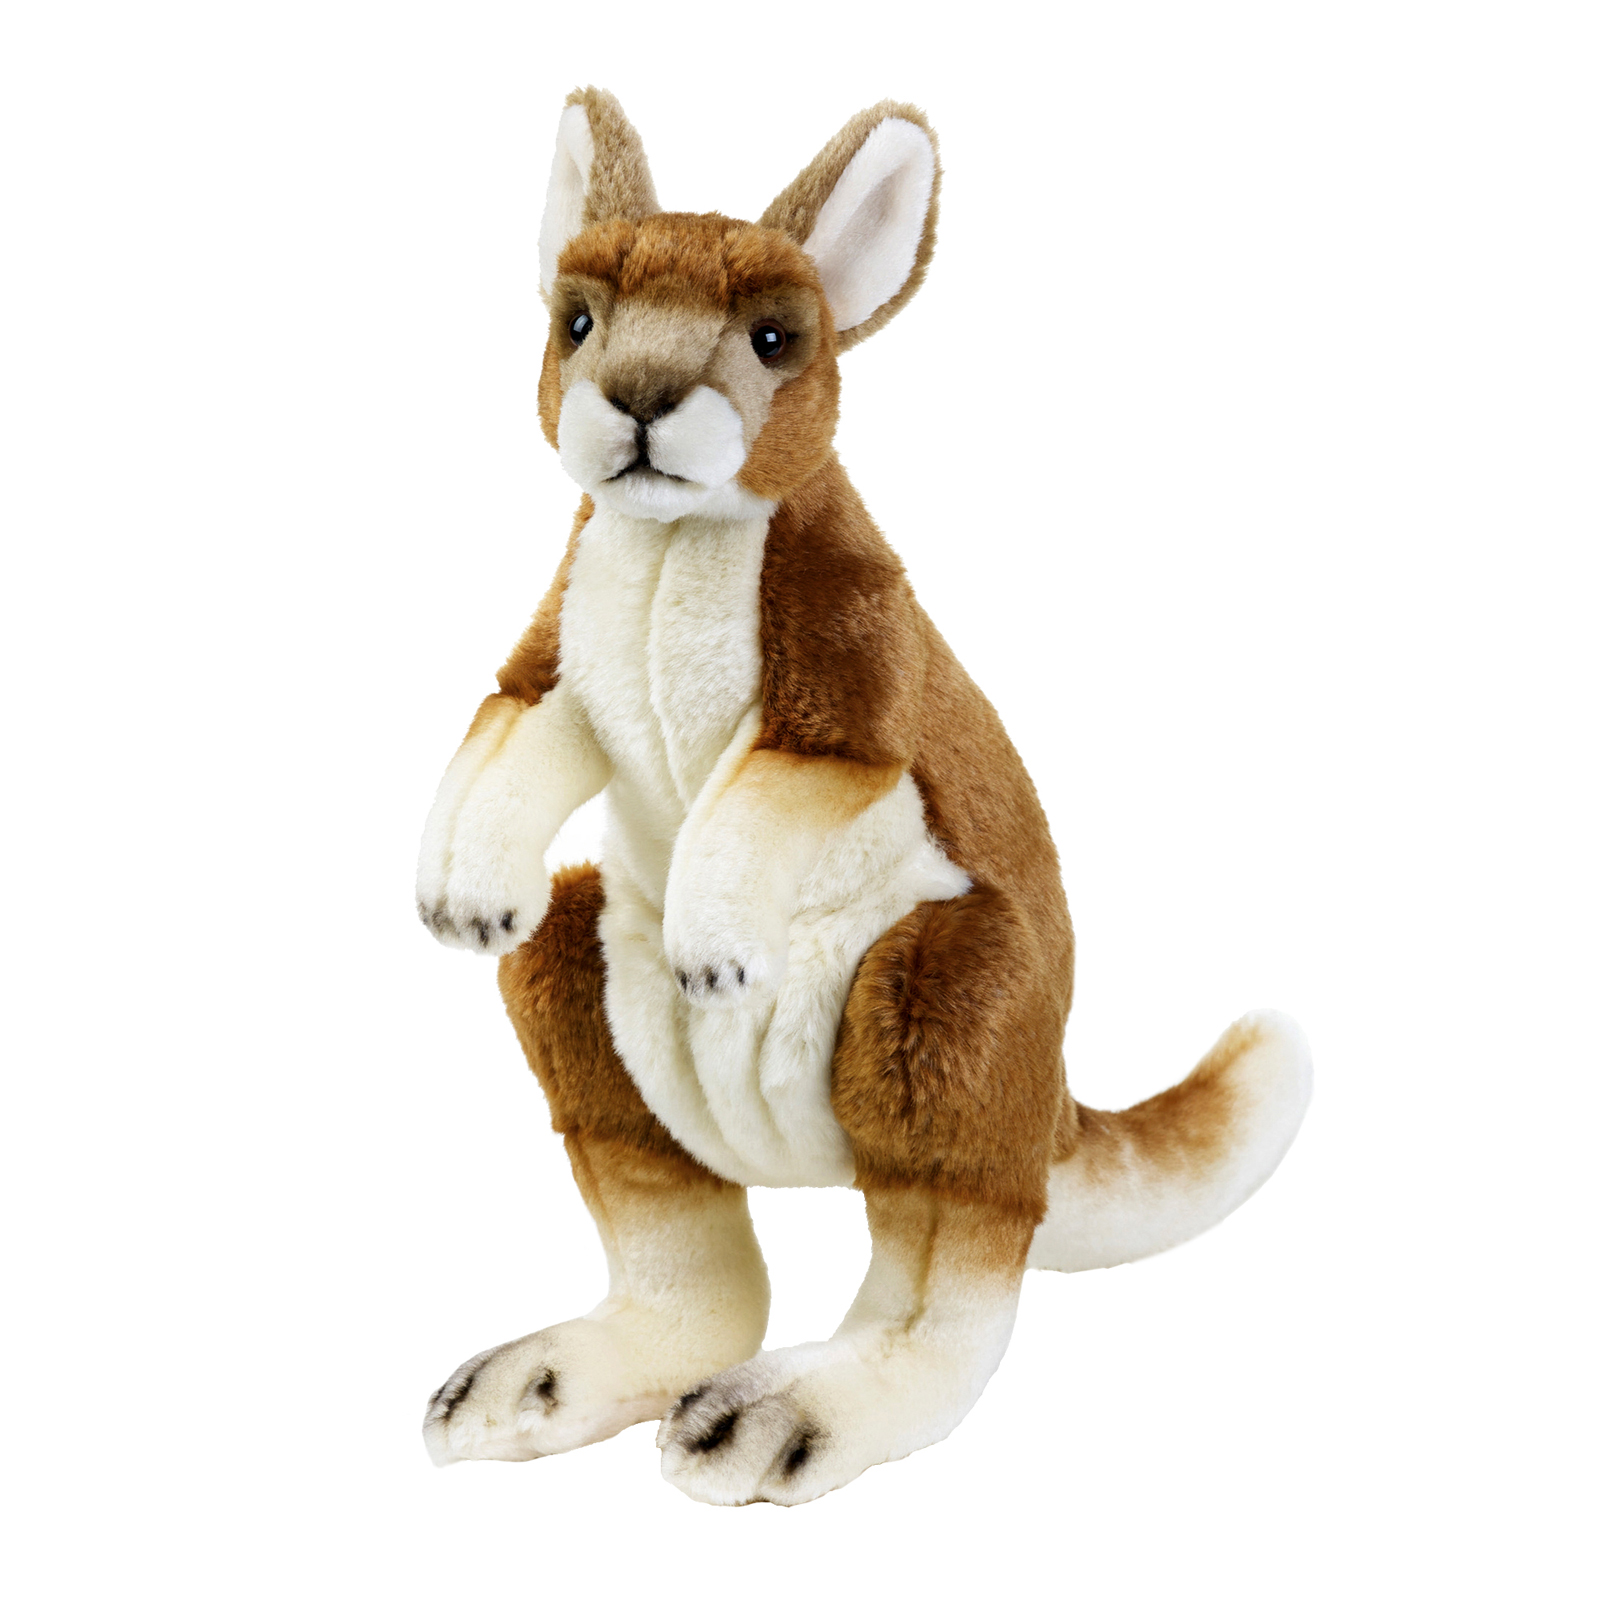 National Geographic Kangaroo Plush